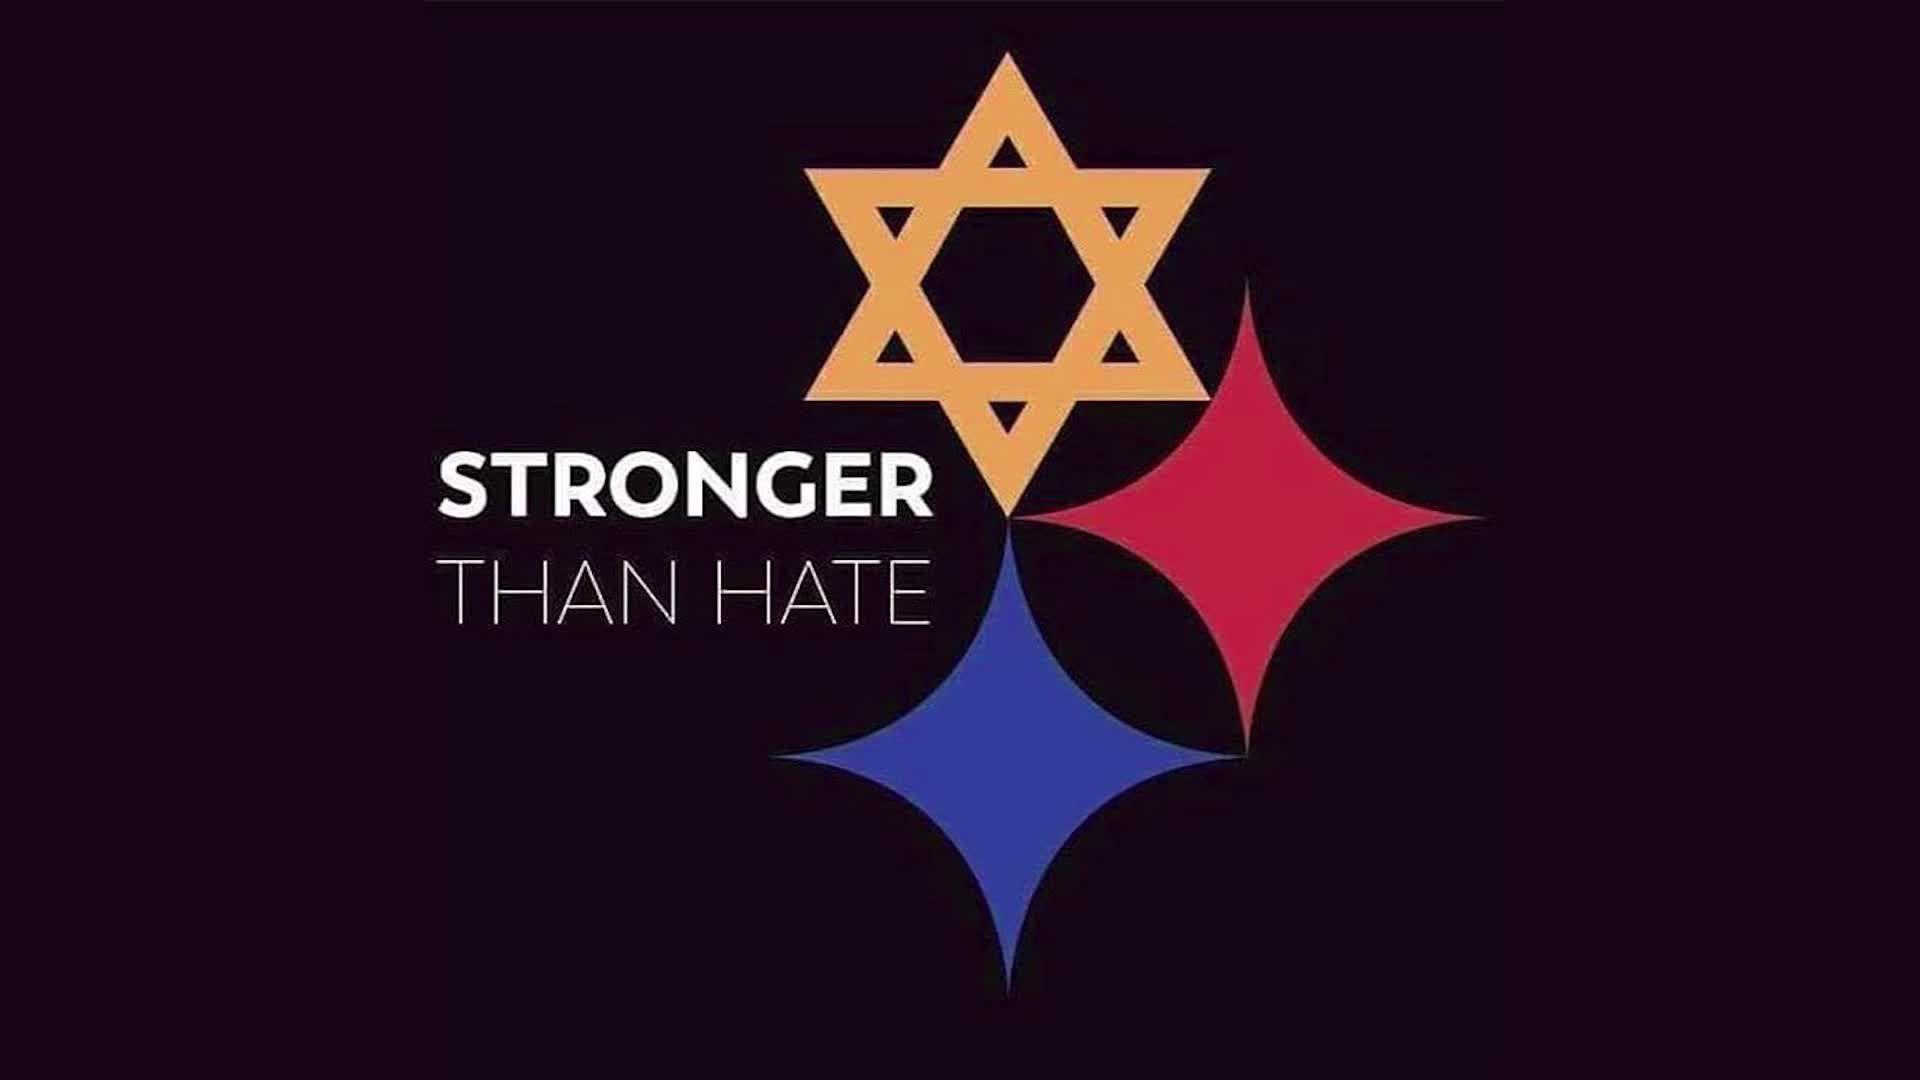 strongerthanhate.jpg